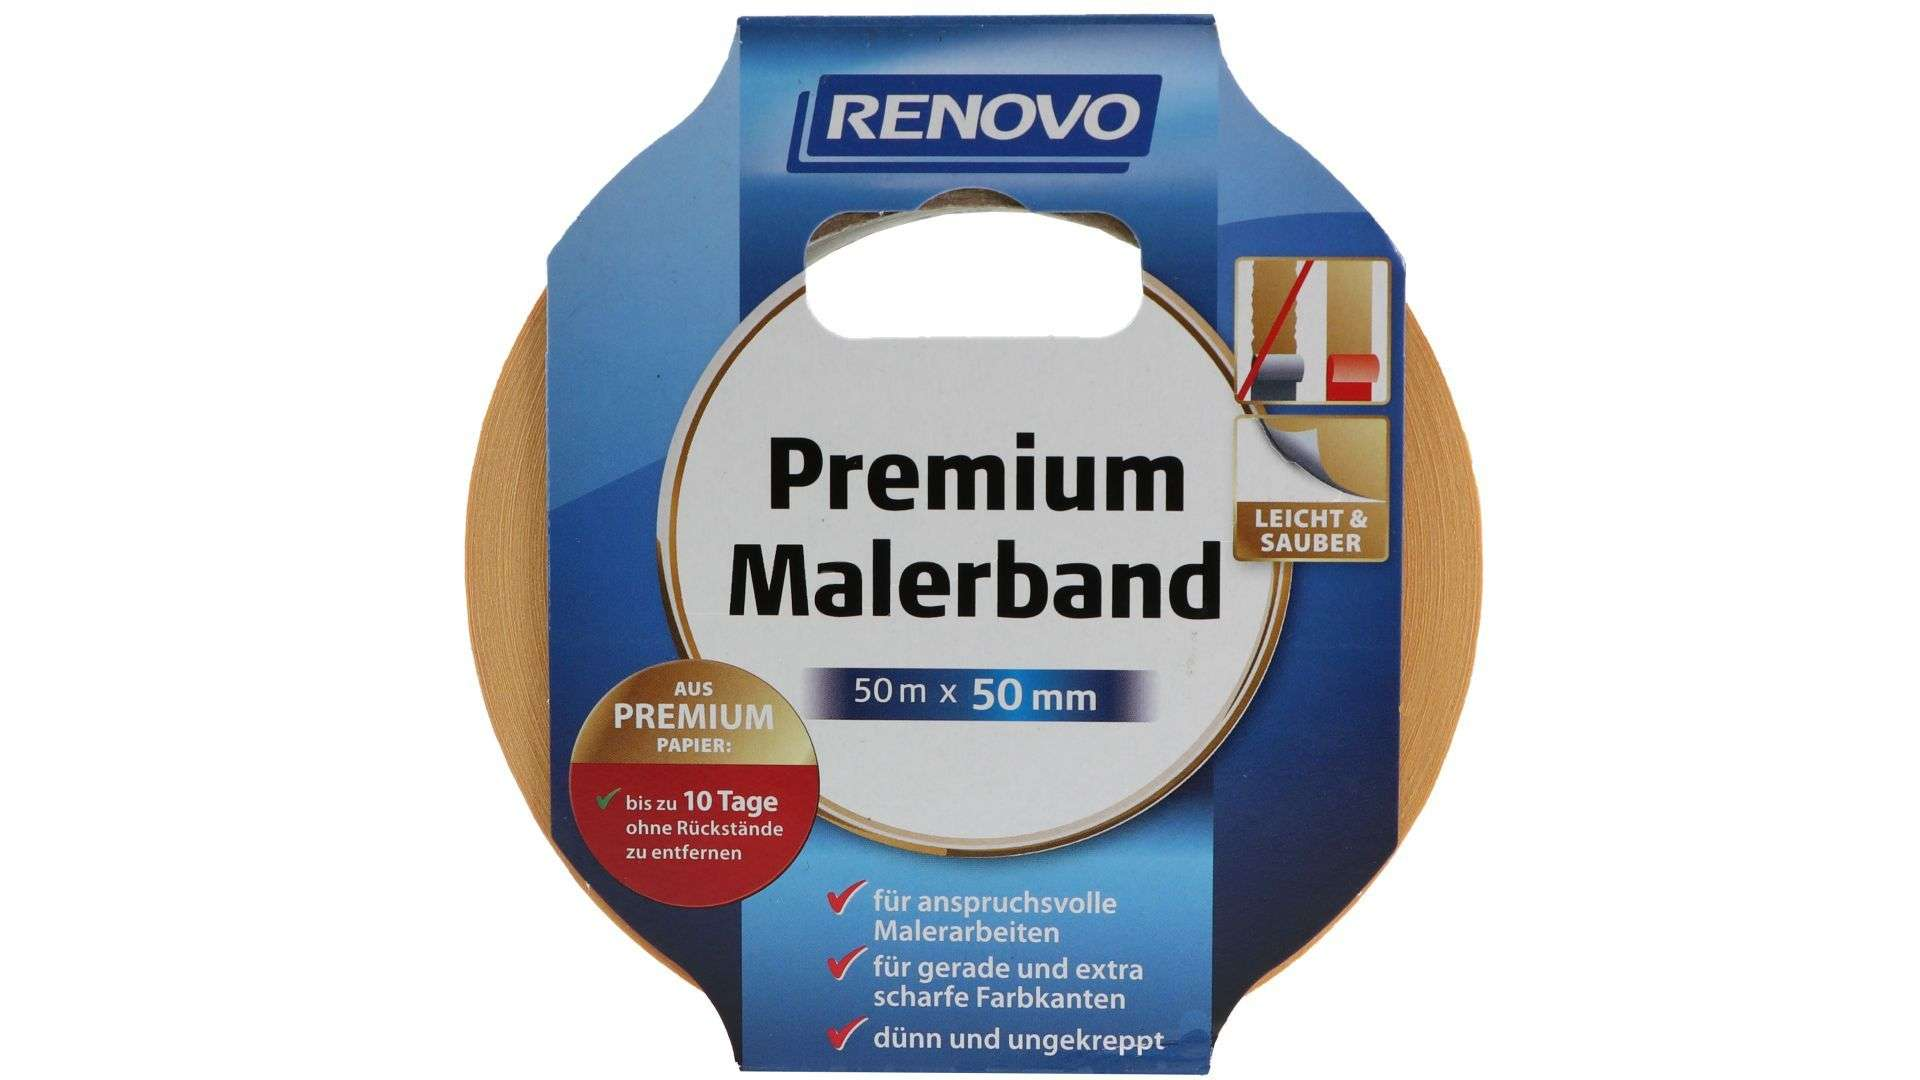 RENOVO Premium Malerband, 50 m x 50 mm